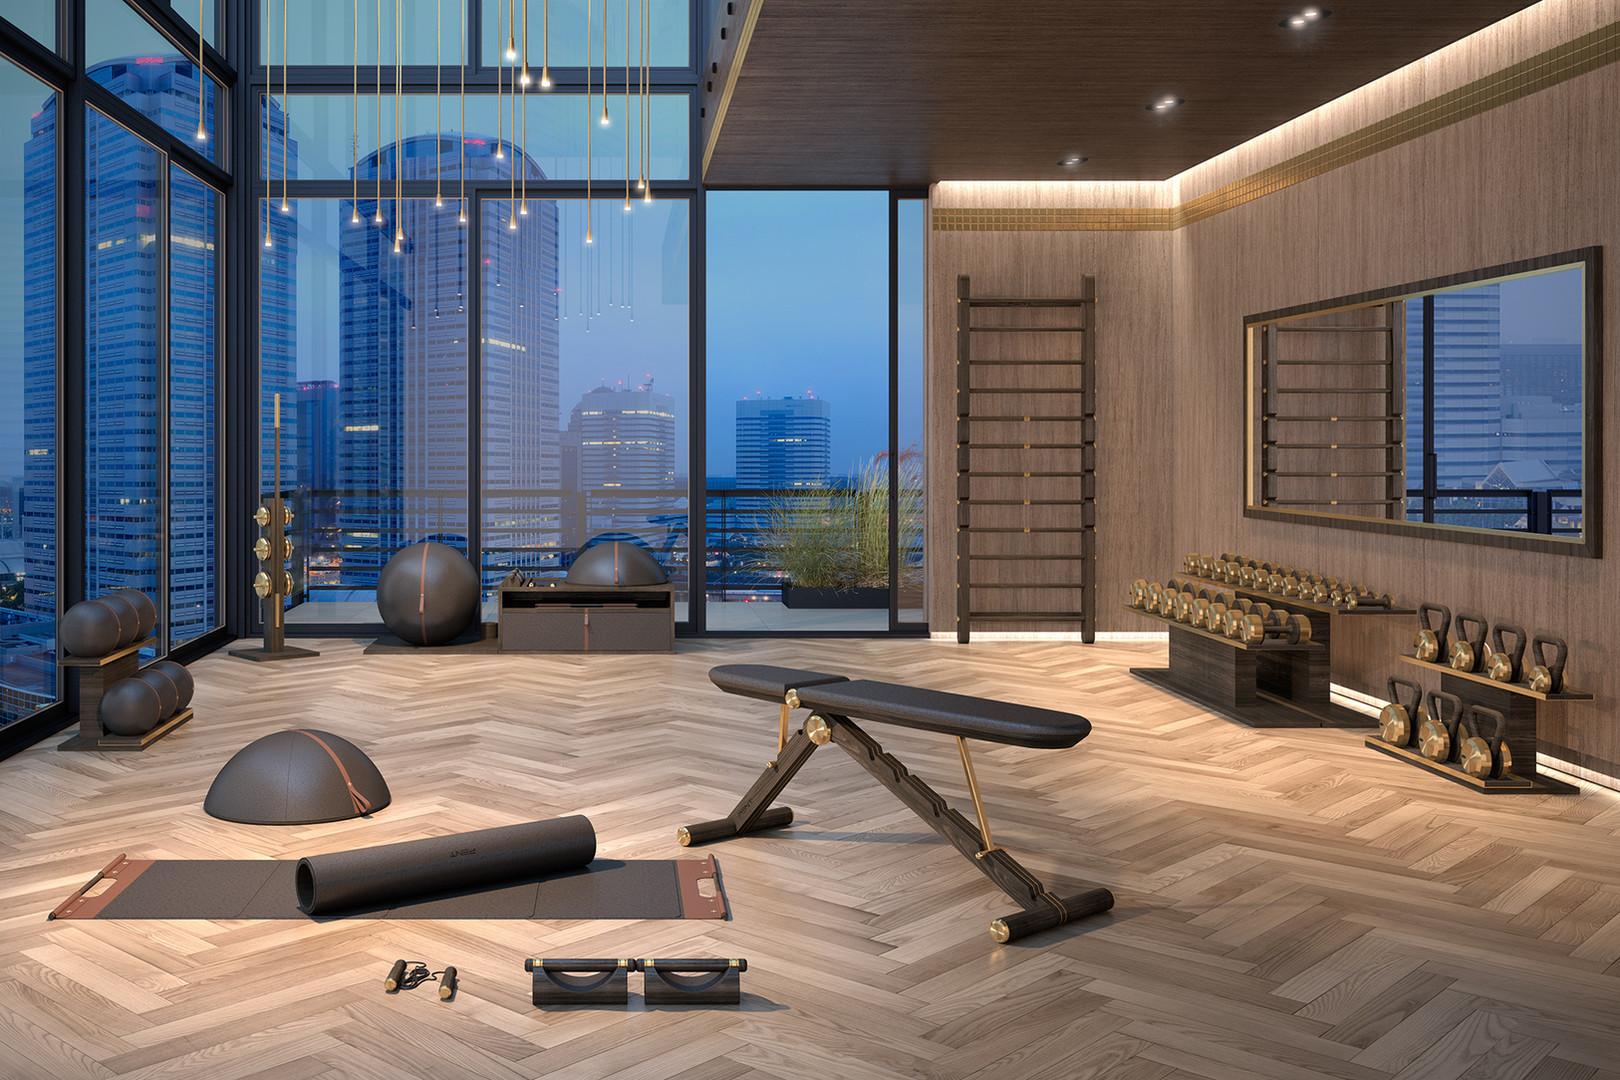 Luxury Bespoke Private Gym Equipment